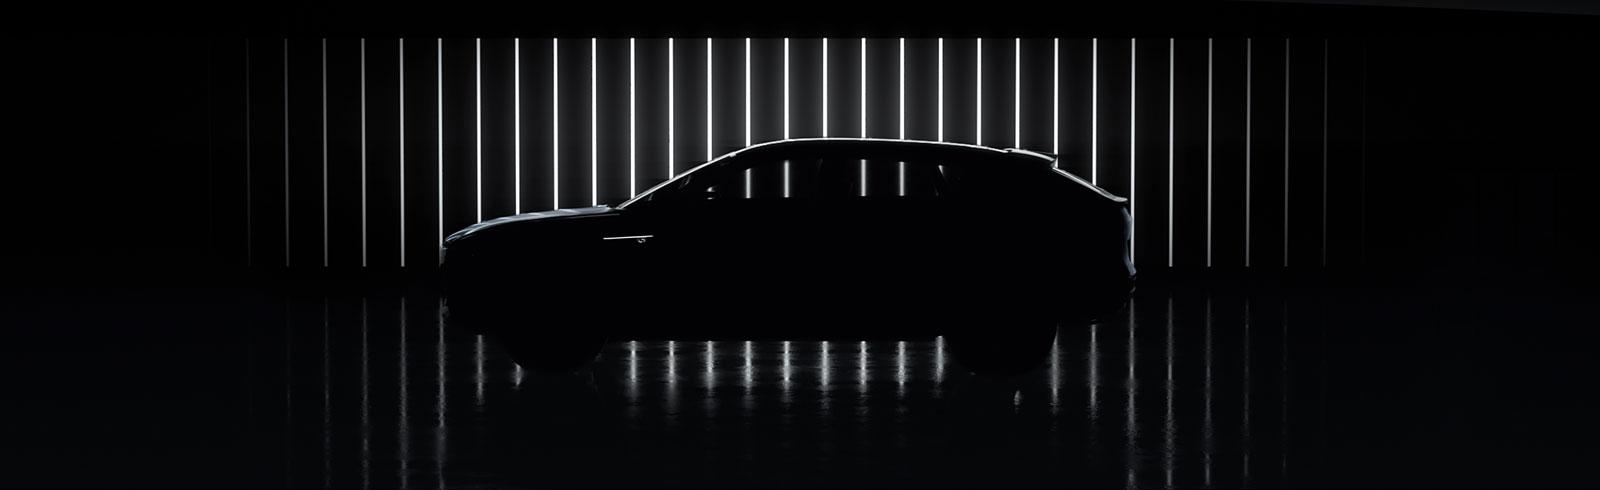 GM will launch 2021 Chevy Bolt EV, 2022 Bolt EUV, Cadillac Lyriq and GMC HUMMER EV